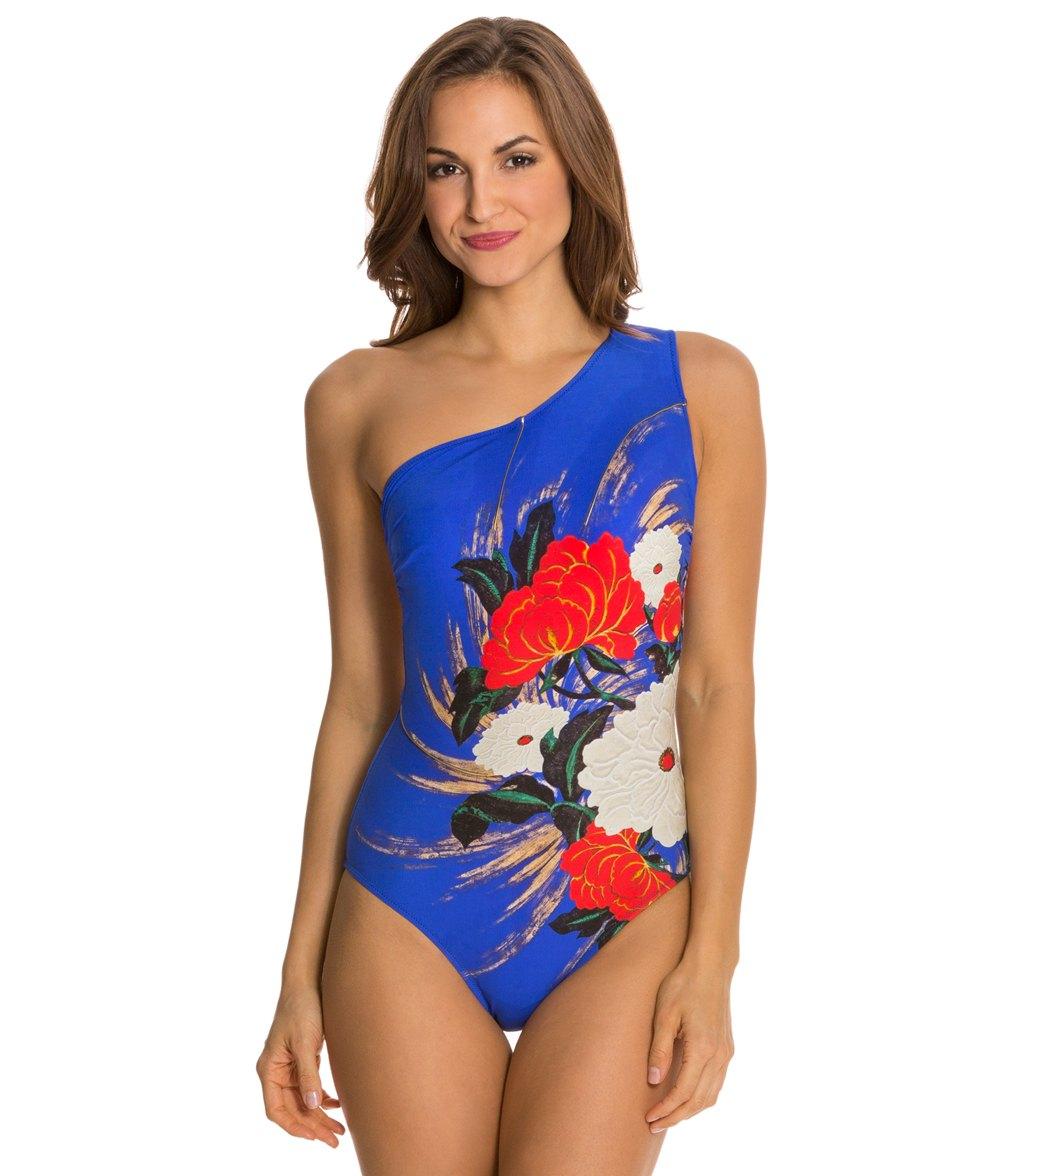 282d540b6b526 ... Gottex Mandarin One Shoulder One Piece Swimsuit Play Video. MODEL  MEASUREMENTS